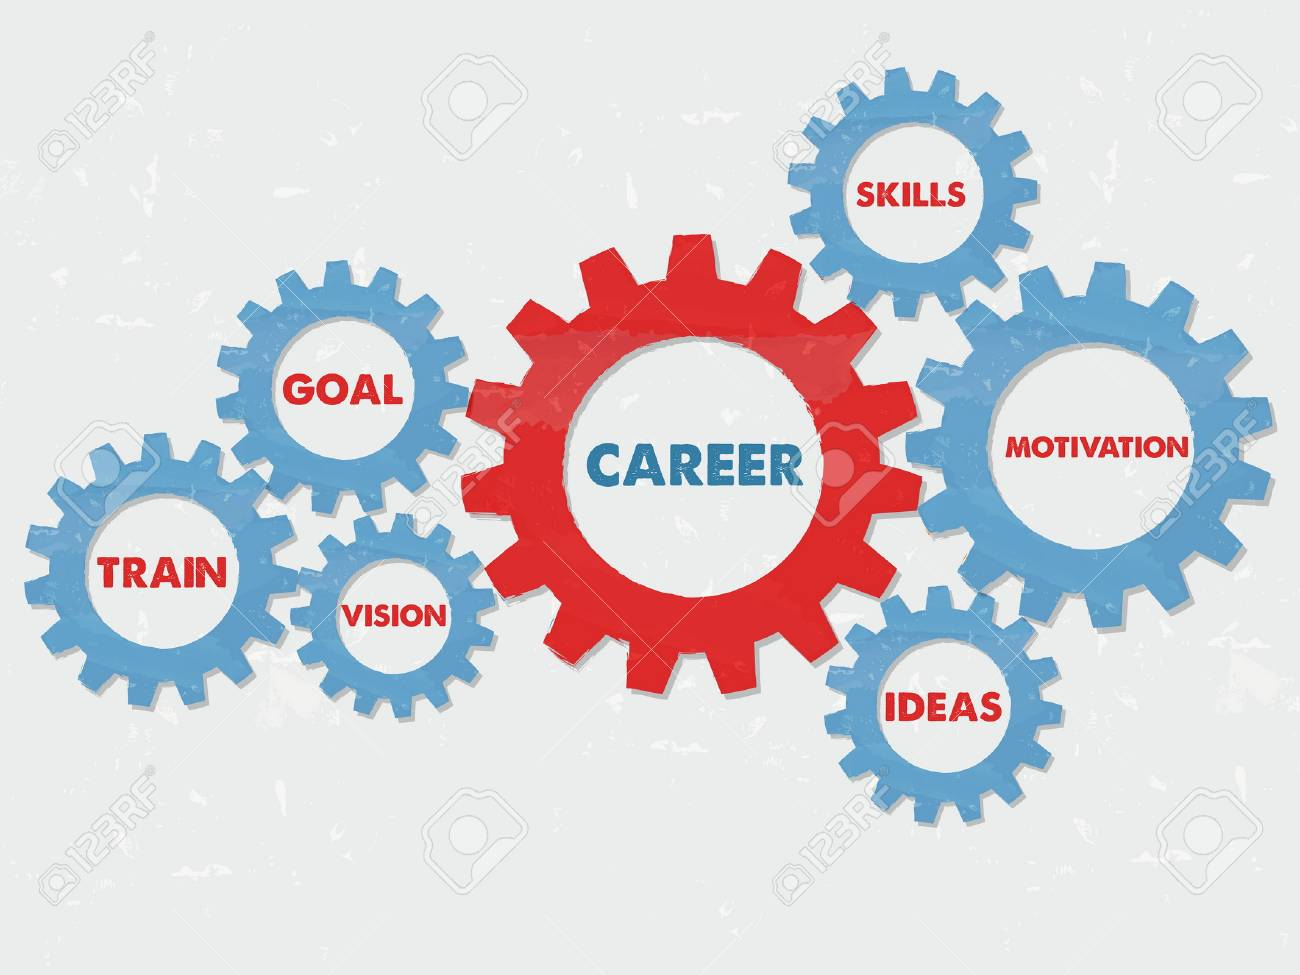 Carrera, Habilidades, Motivación, Ideas, Meta, Tren, Visión ...